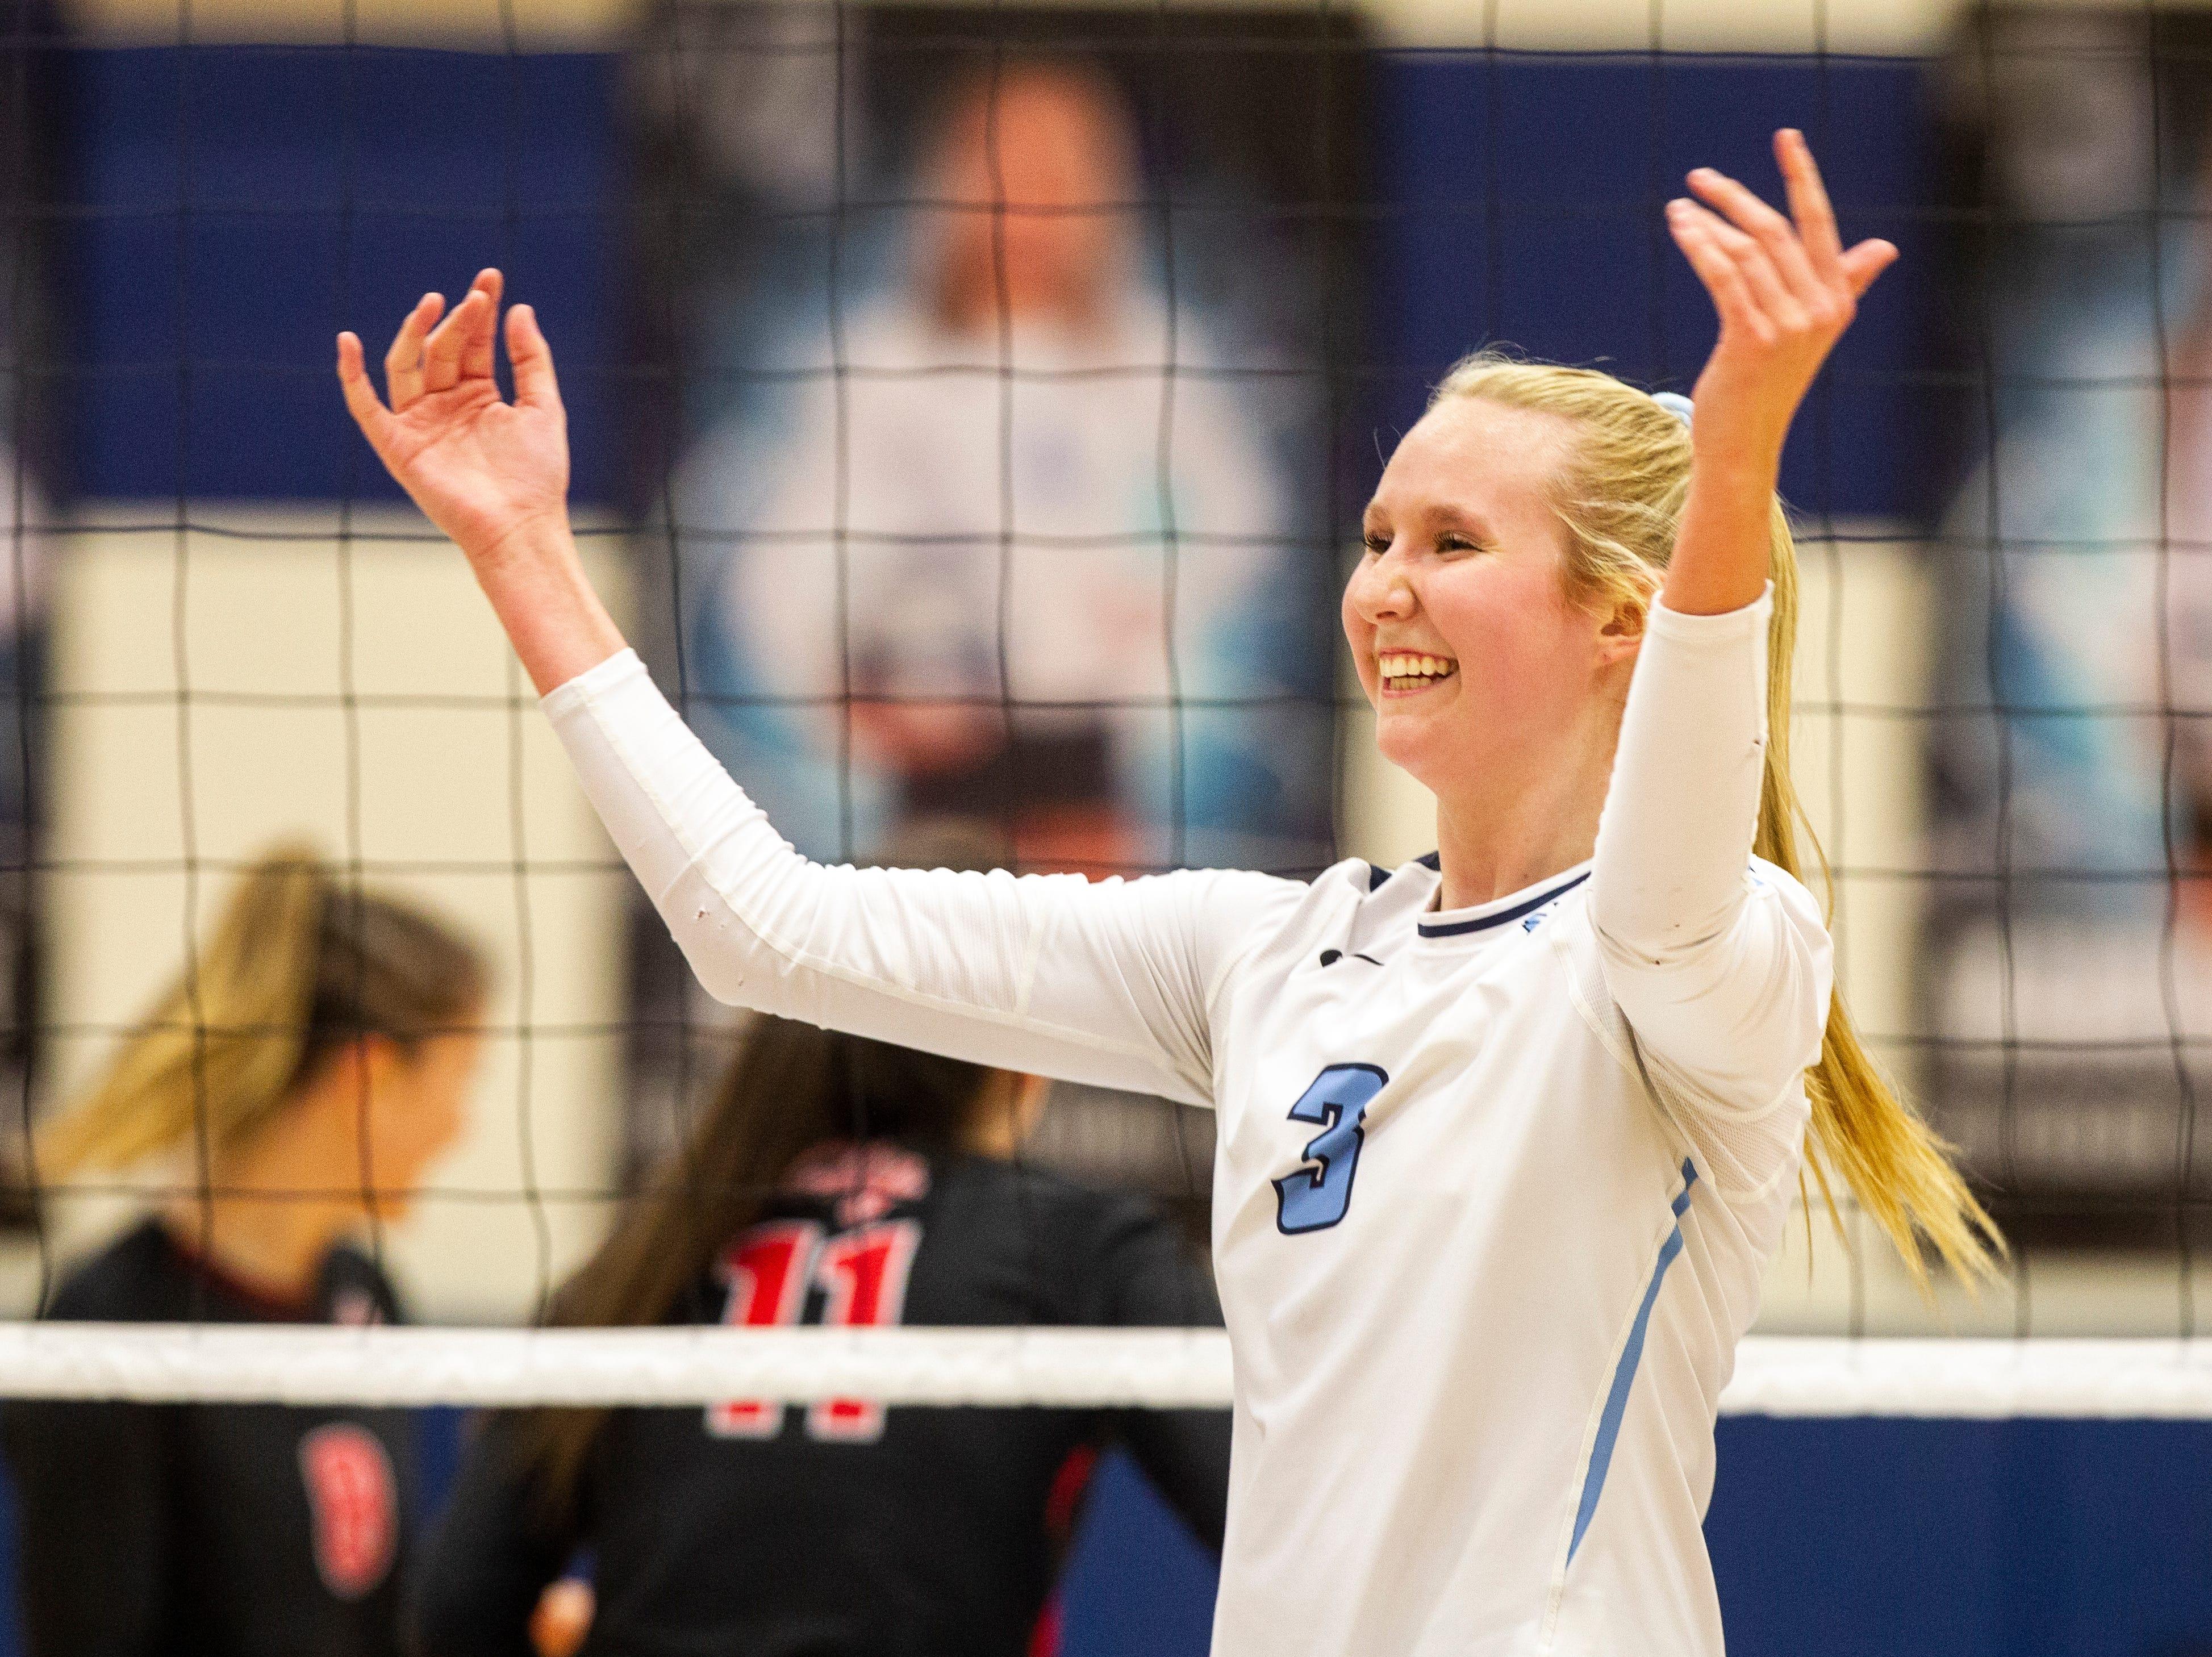 Cedar Rapids Jefferson's Maddy Baxter (3) celebrates a point during a Class 5A volleyball regional final game on Monday, Oct. 29, 2018, at Jefferson High School in Cedar Rapids.